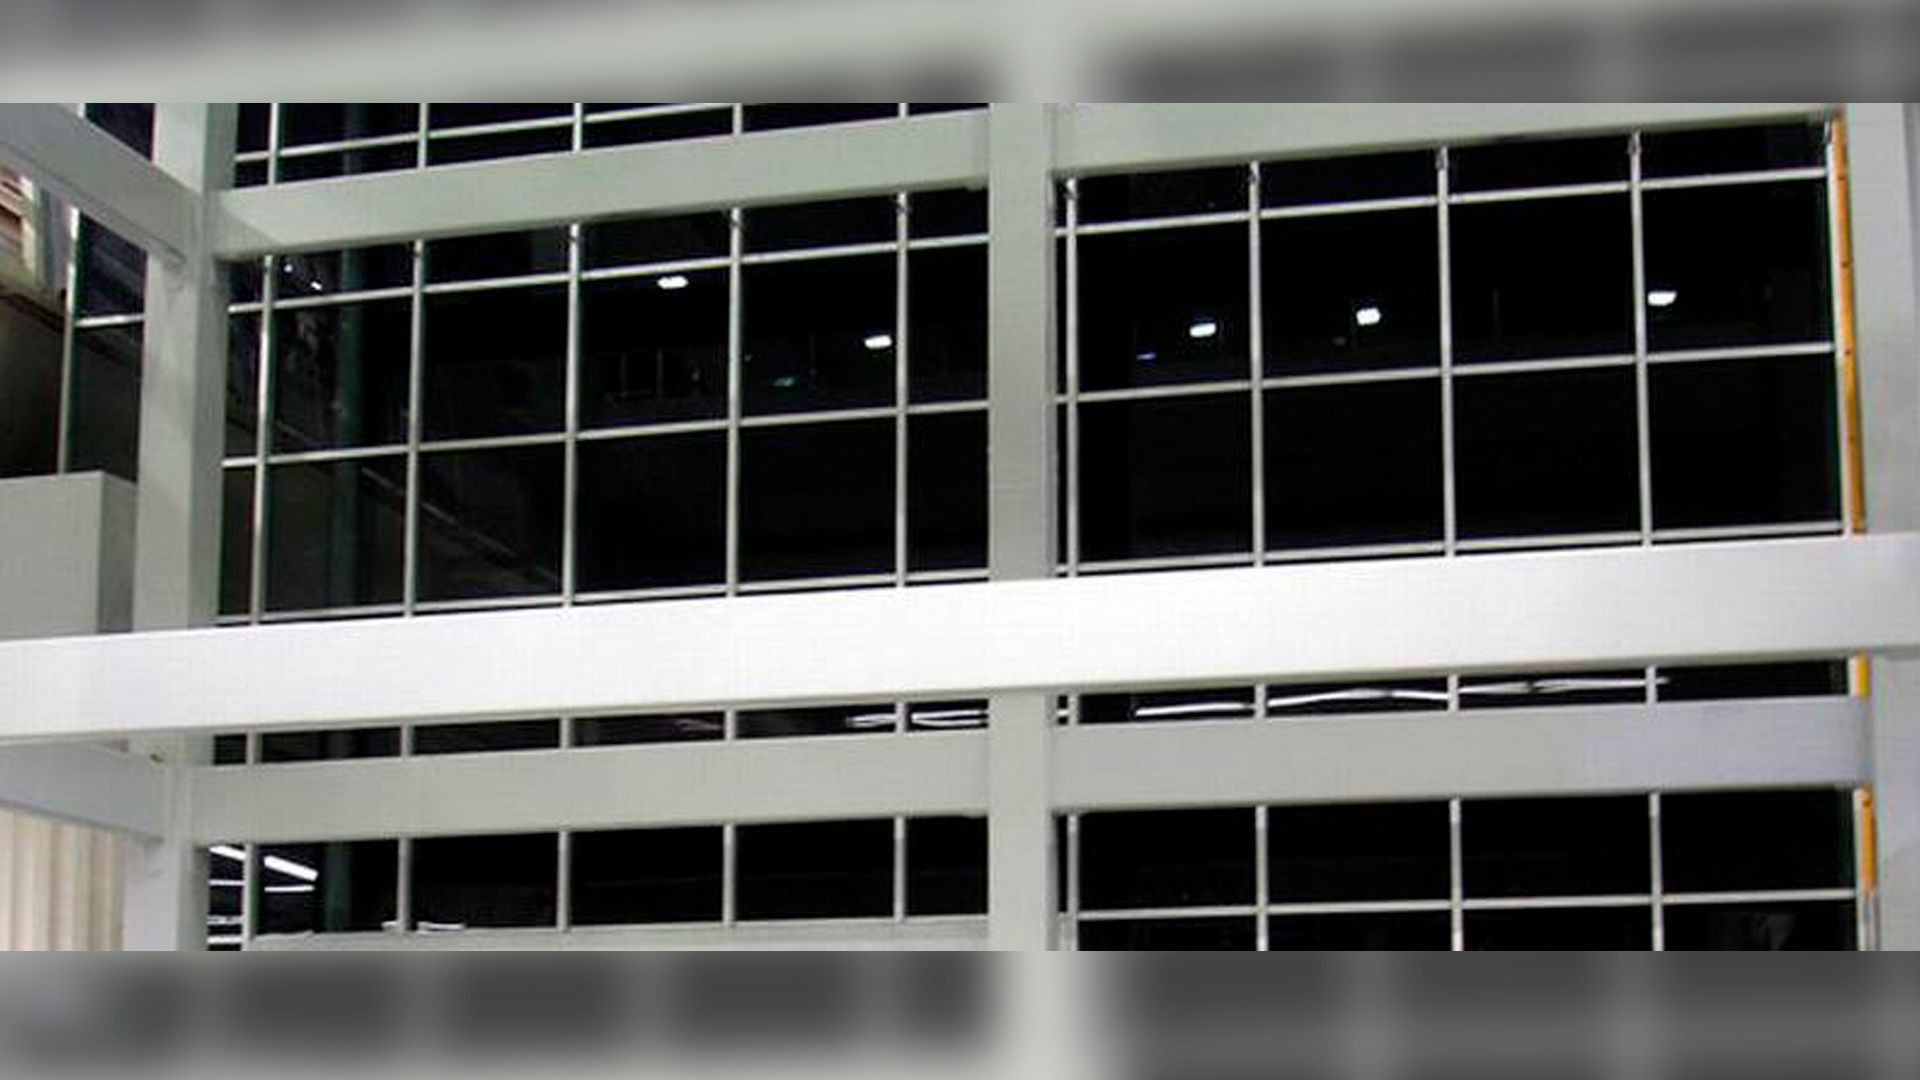 Fábrica de aluminio en Tenerife